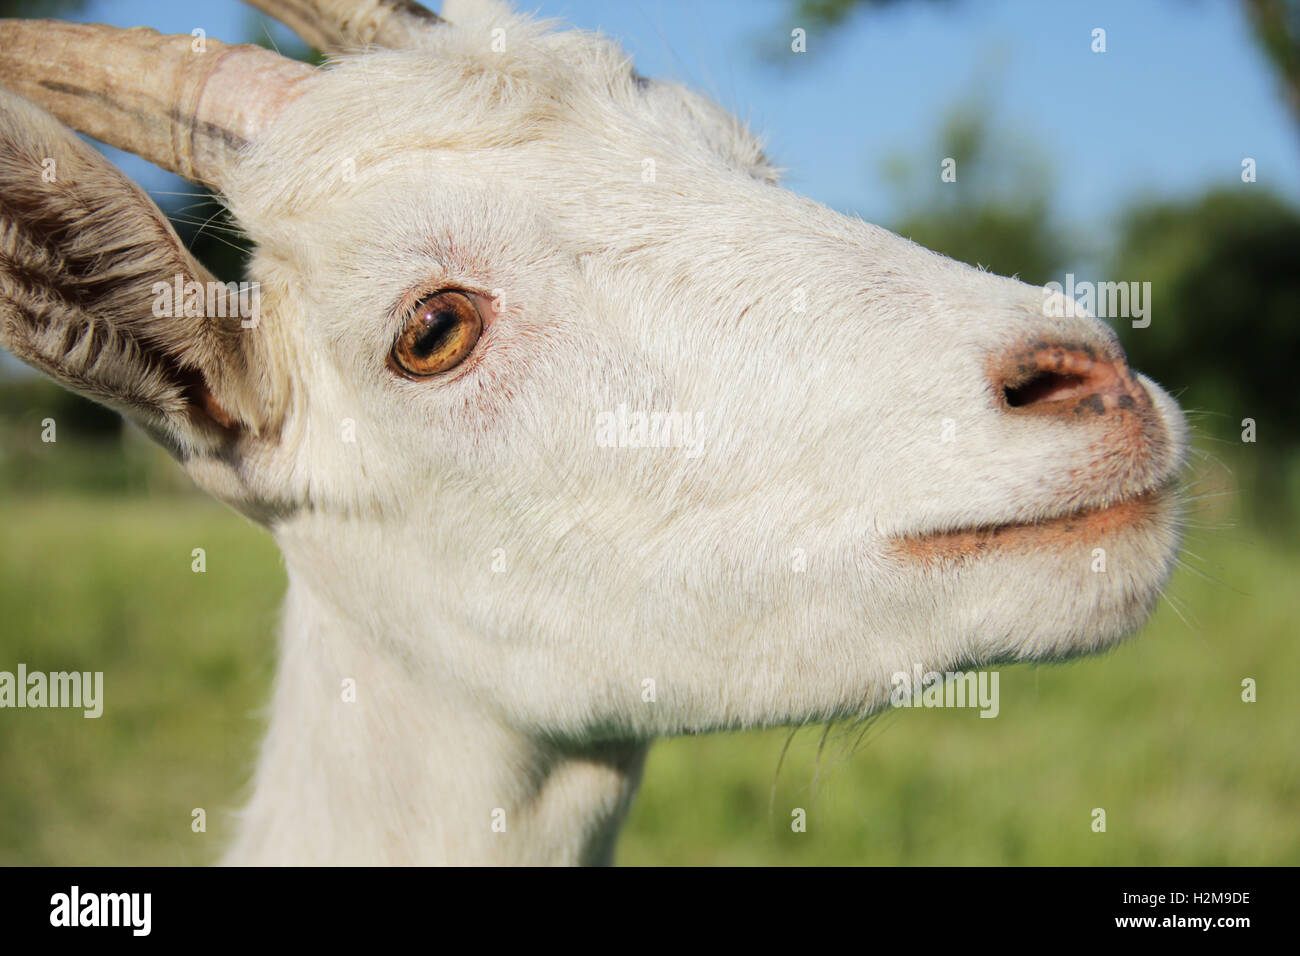 Funny white goat portrait close up photo - Stock Image